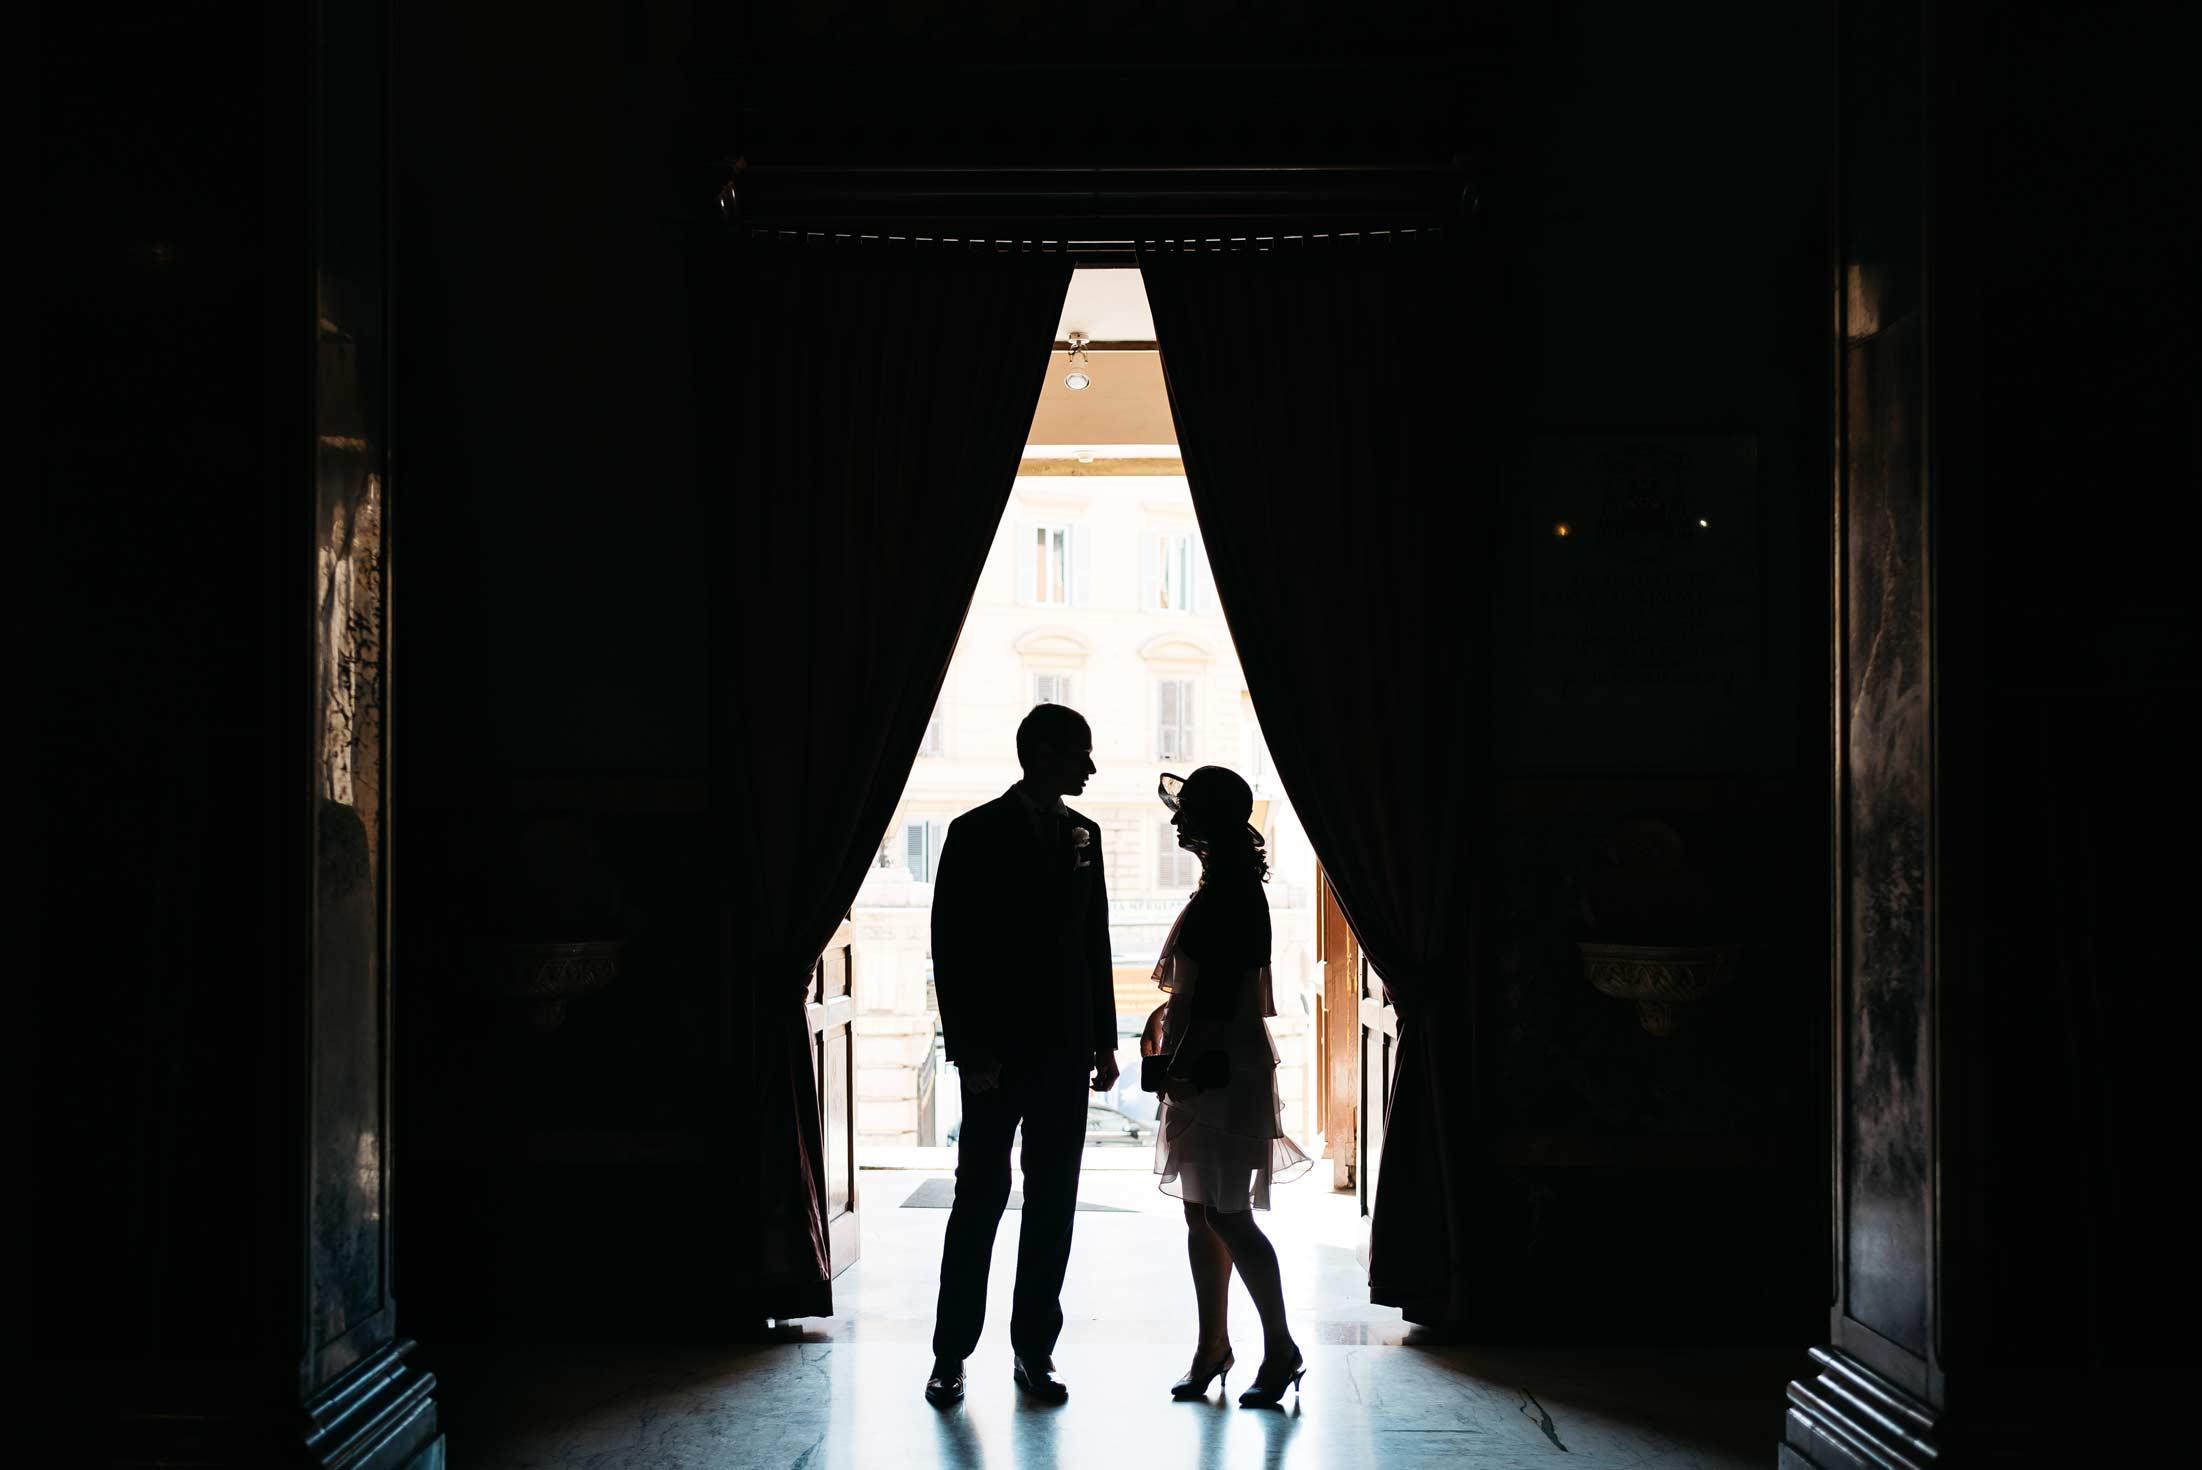 Fotografo-Matrimonio-Roma-Stile-Reportage-Cerimonia